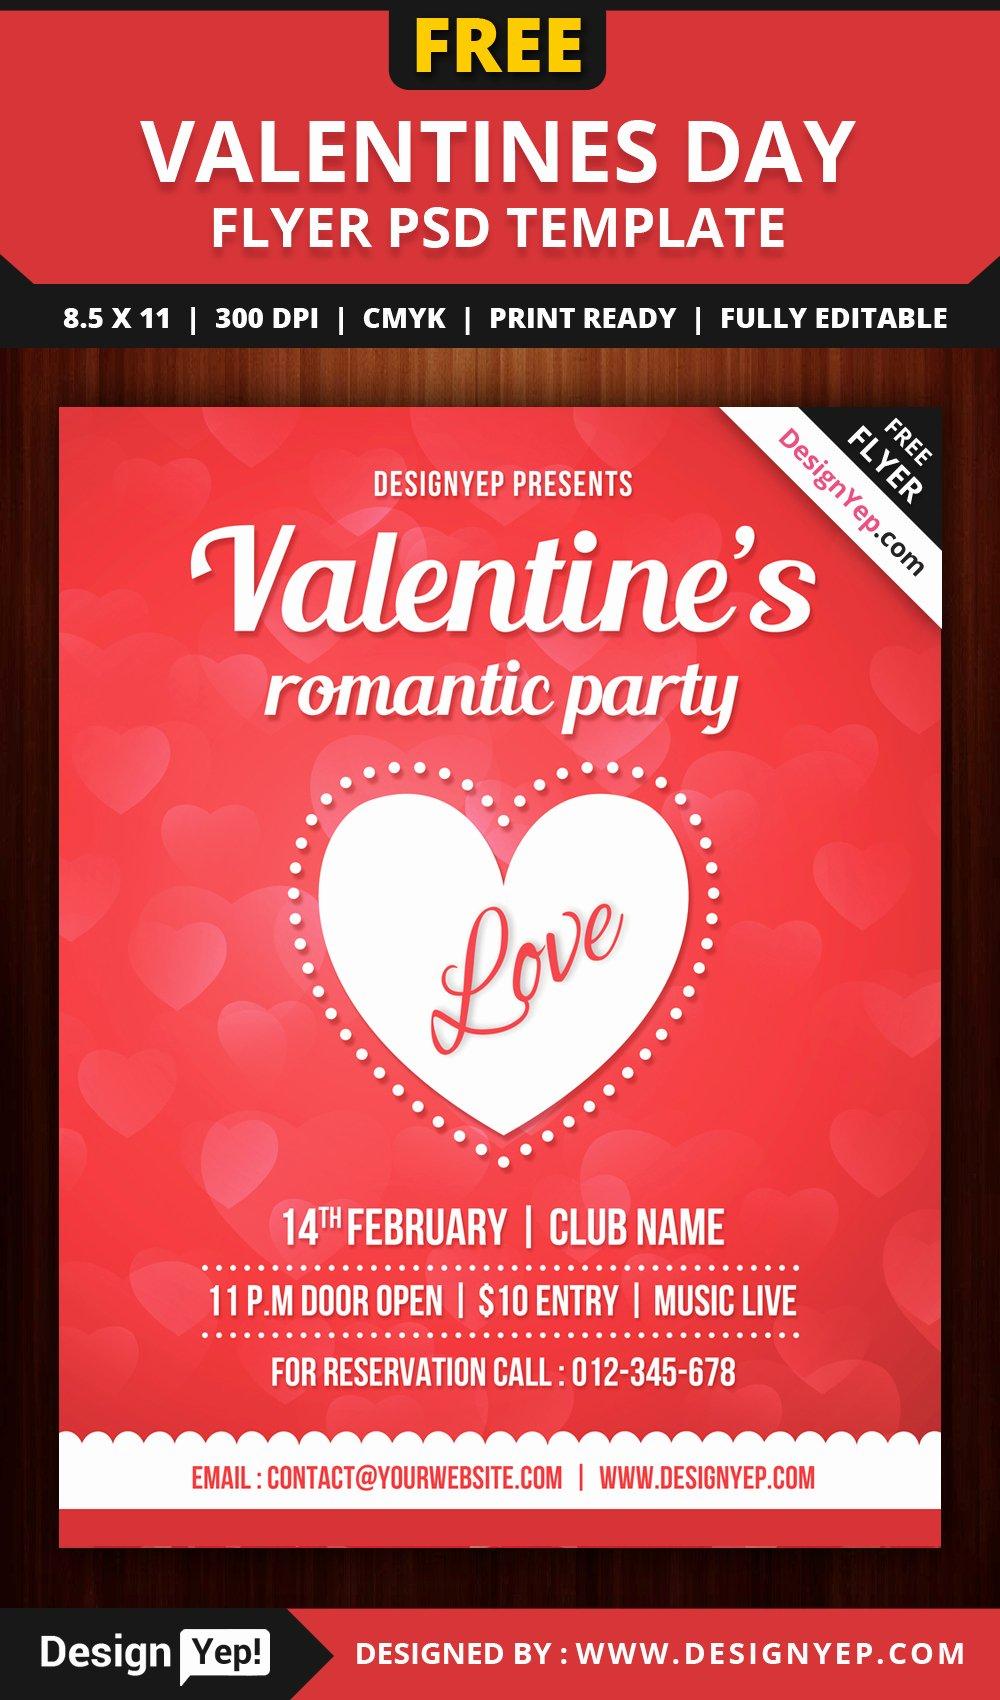 Free Party Flyer Templates Elegant Free Valentines Party Flyer Template Psd Designyep